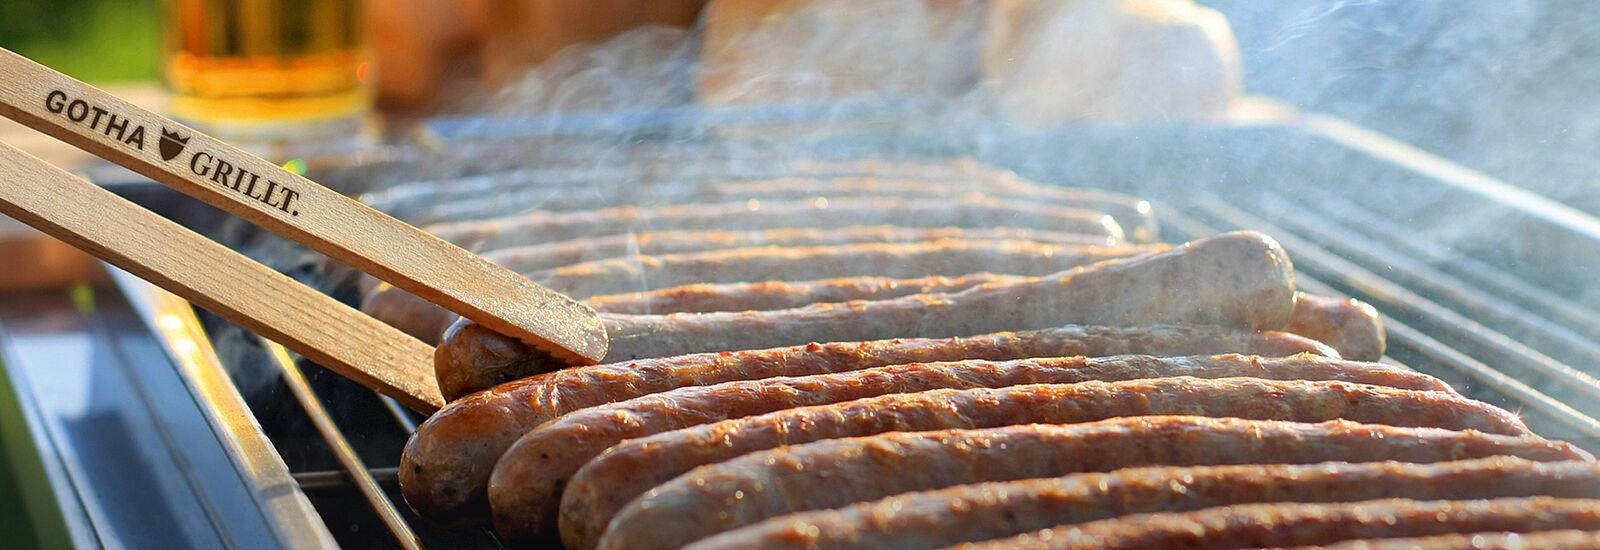 Thüringer Spezialitäten - Thüringer Bratwurst